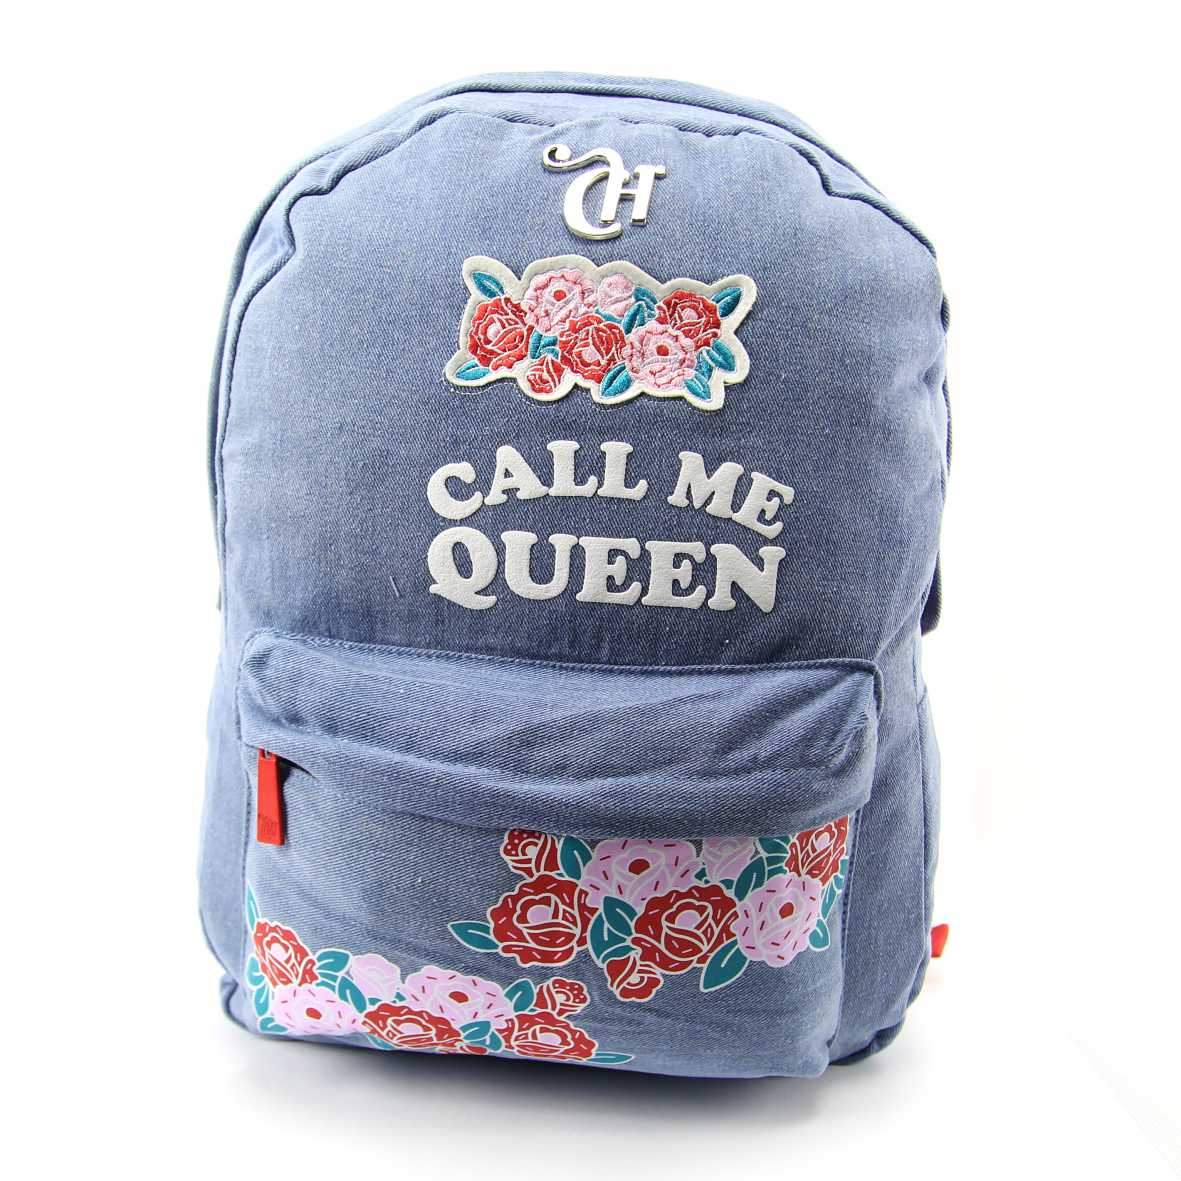 Mochila Capricho de Costas Jeans Feminino Call me Queen DMW 11291